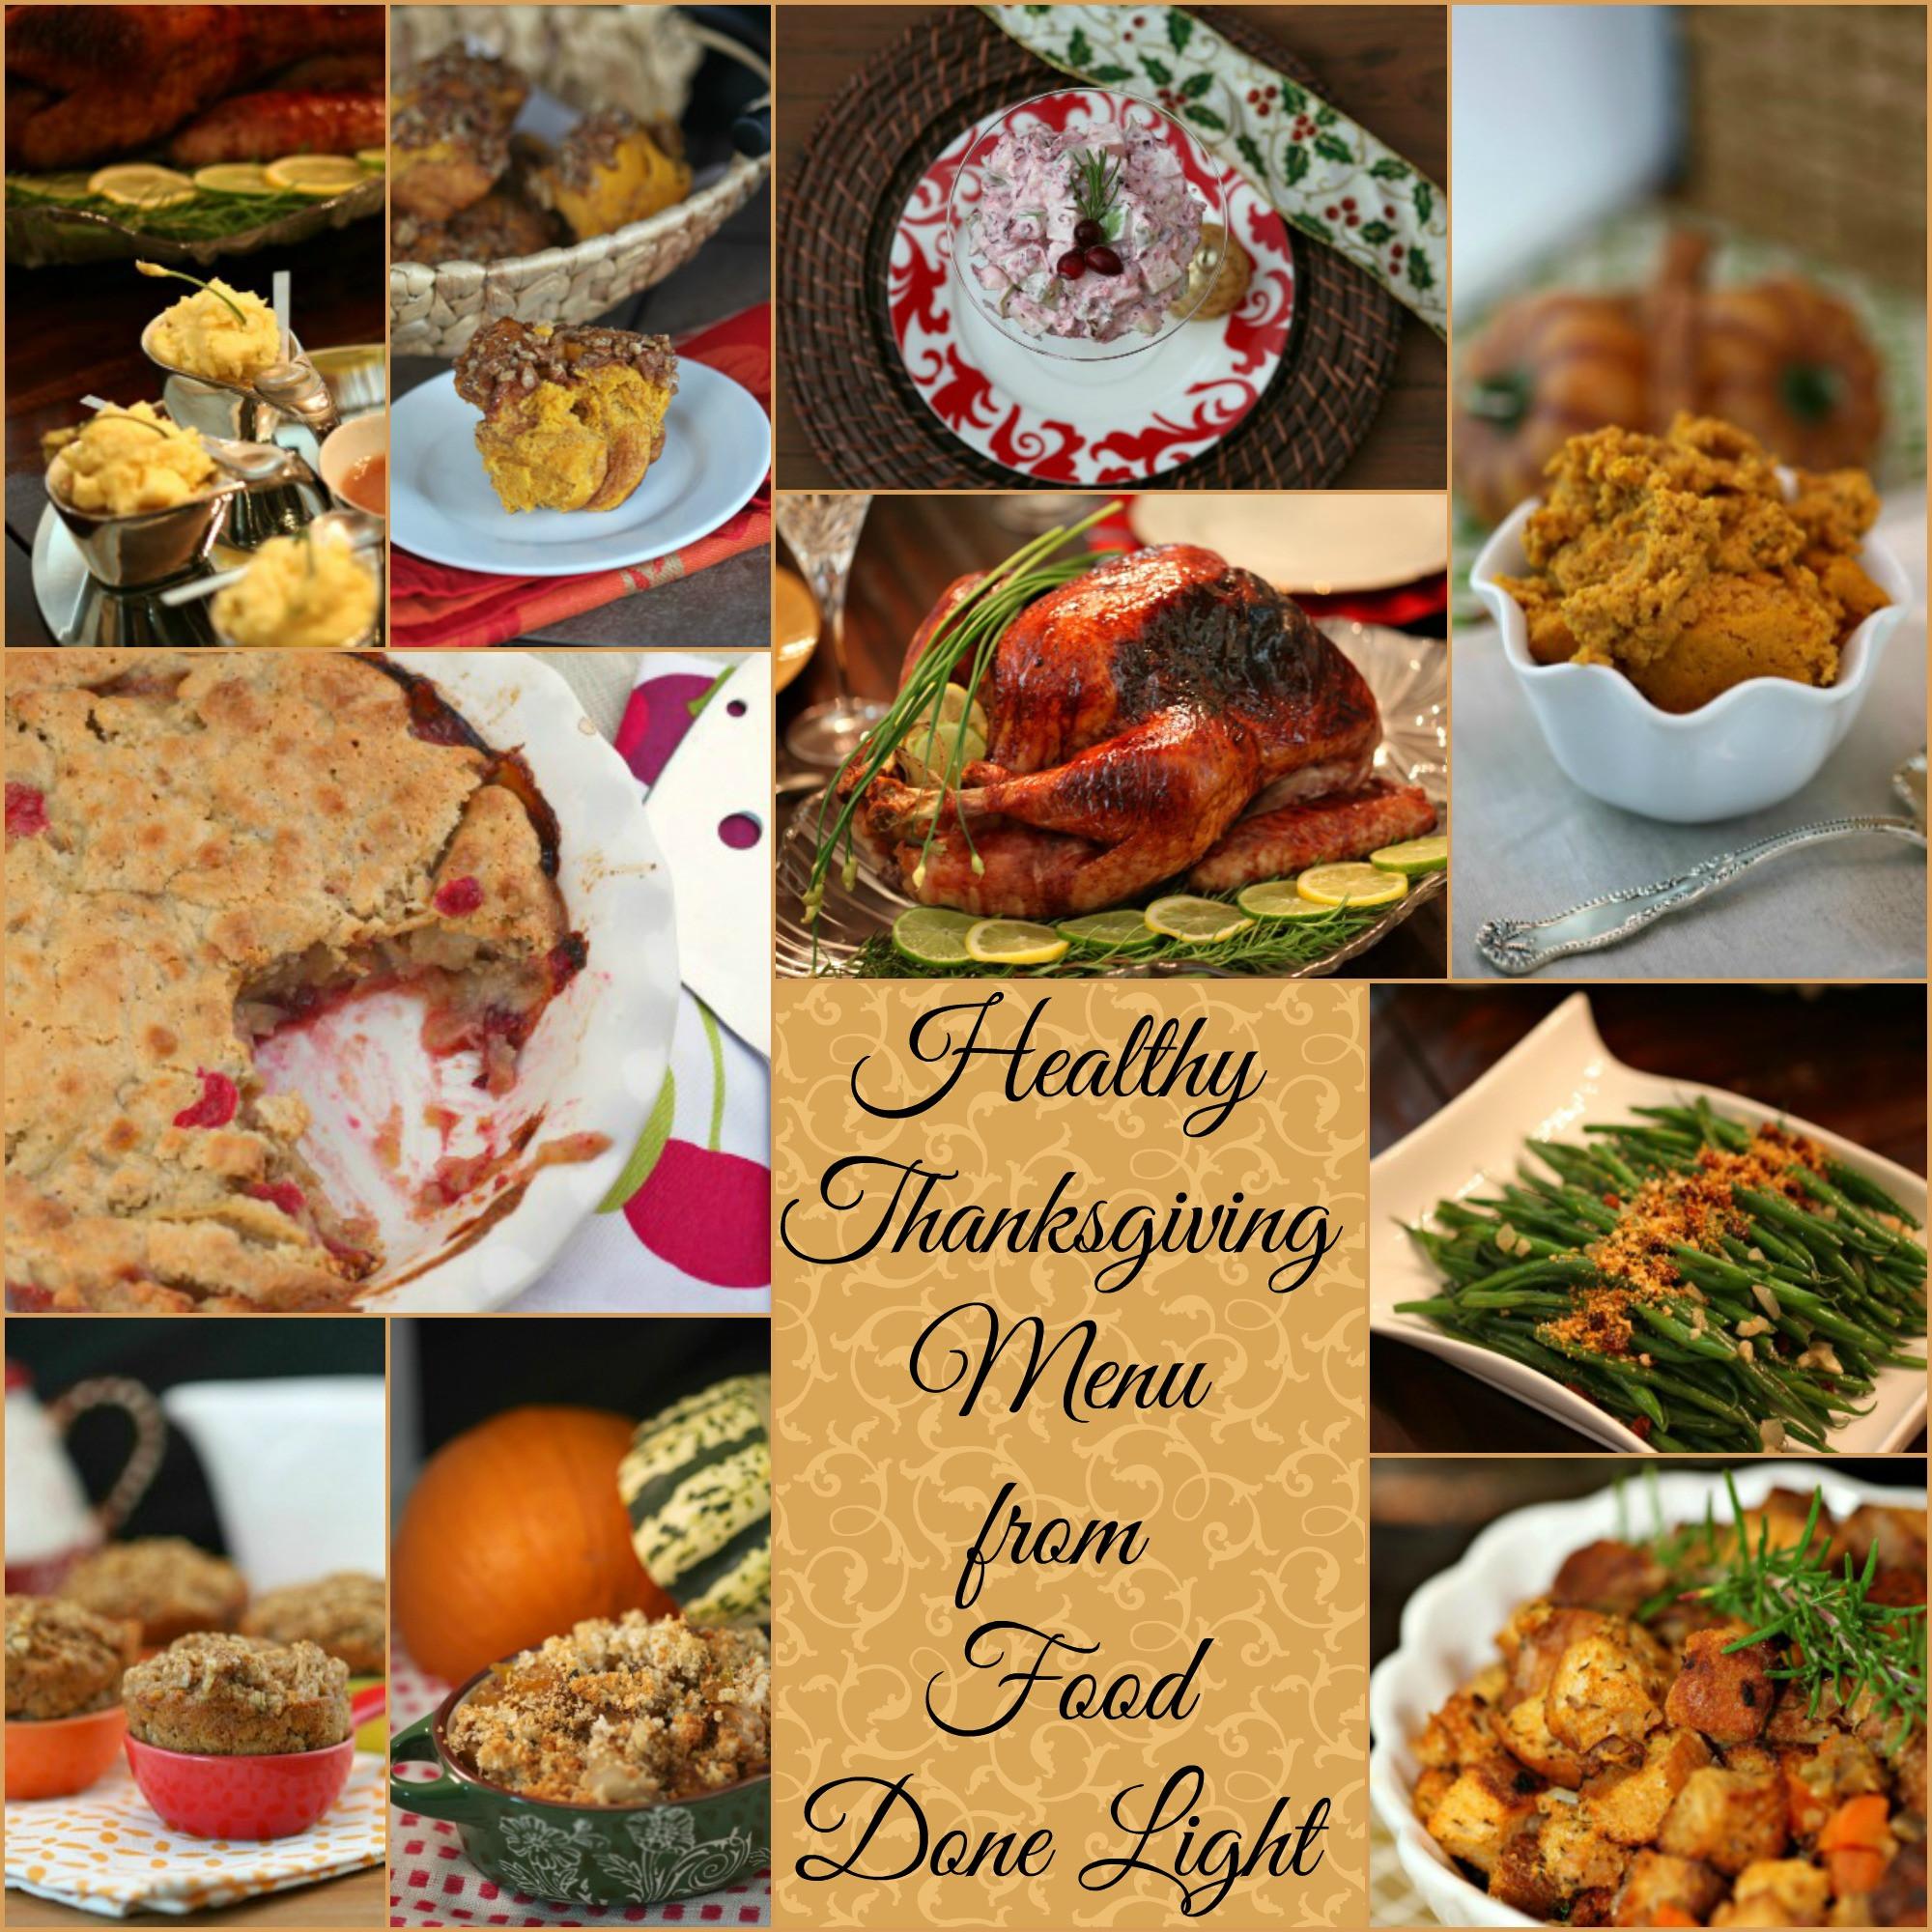 Healthy Thanksgiving Food  Food Done Light Healthy Thanksgiving Menu